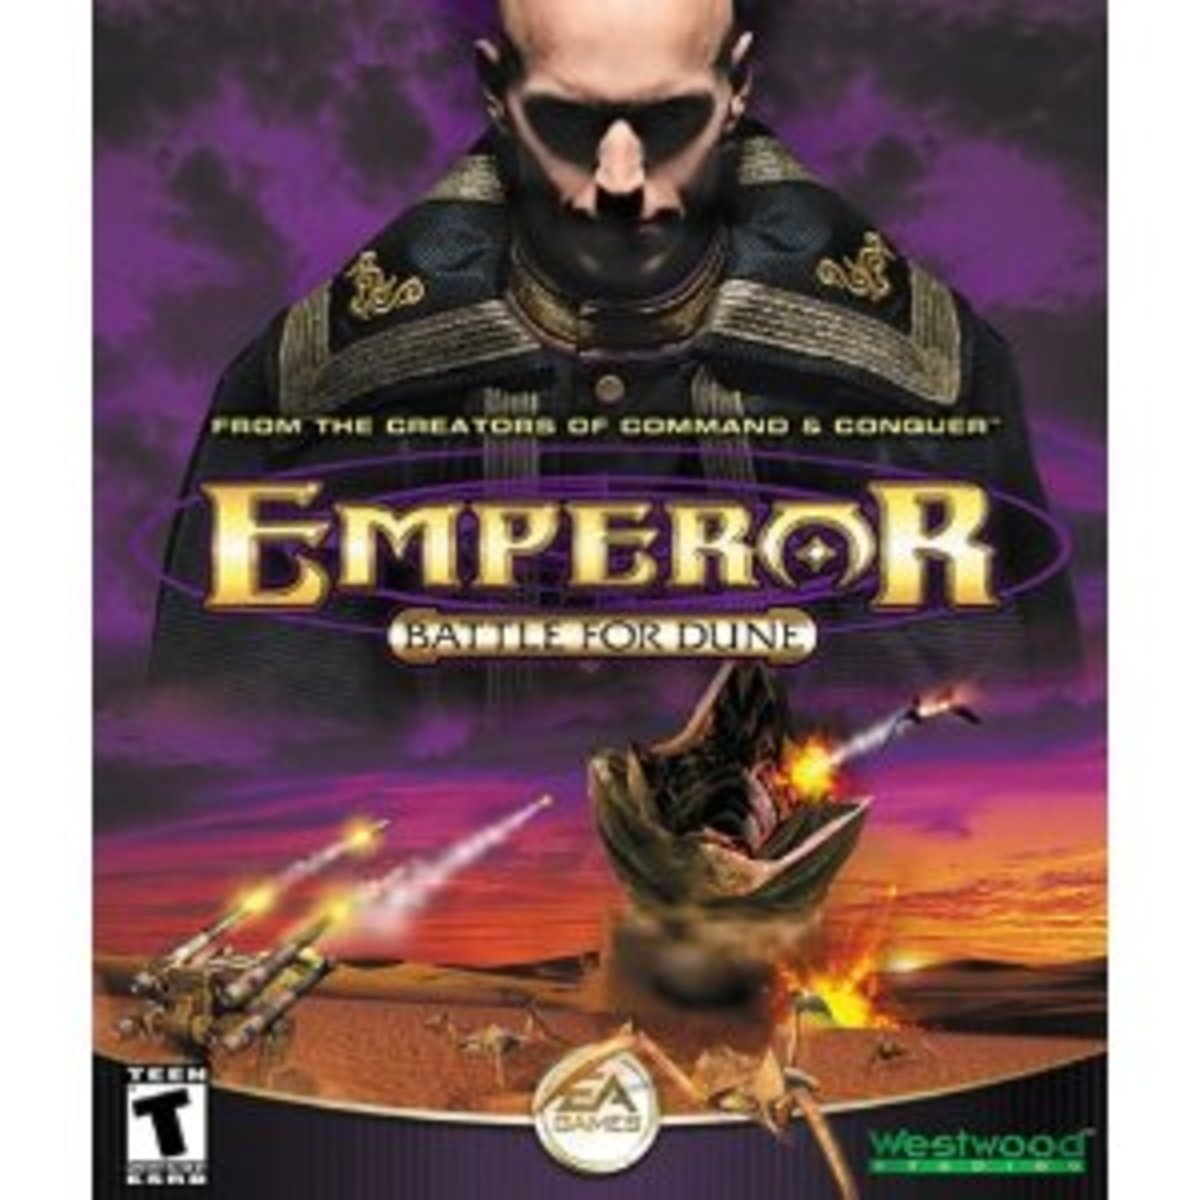 Emperor - Battle for Dune